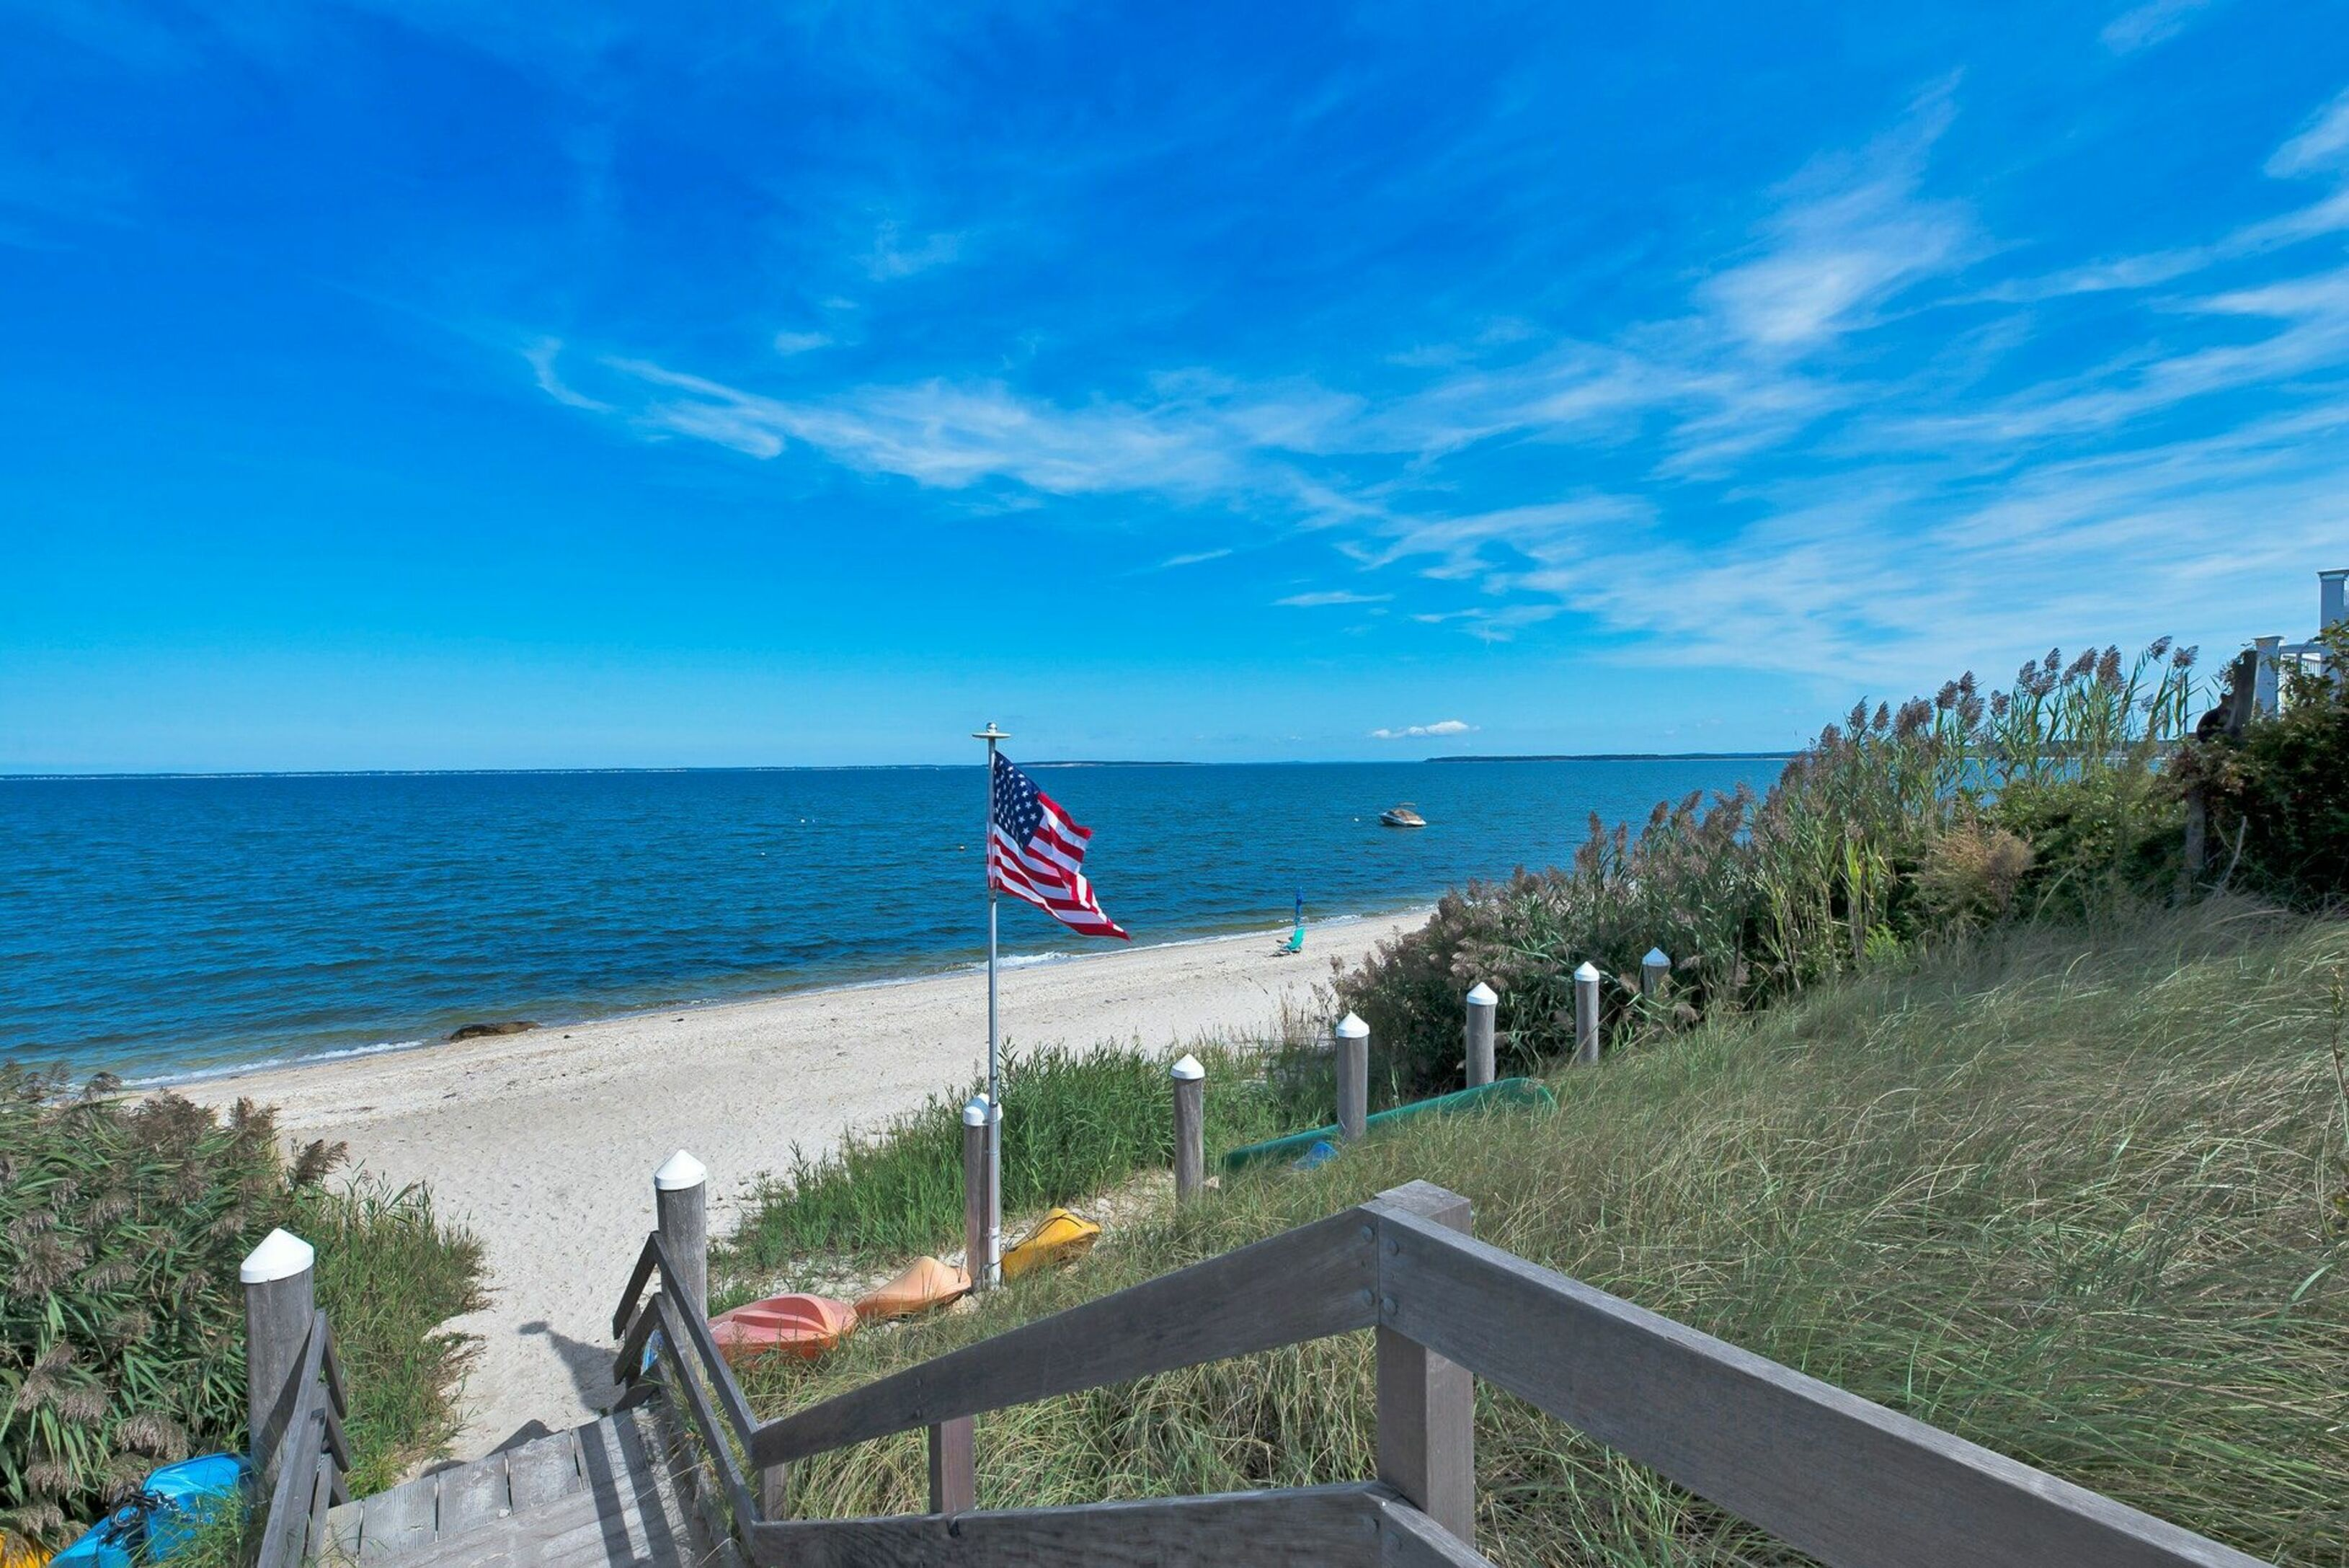 11 Oakhurst Rd - Hampton Bays, New York